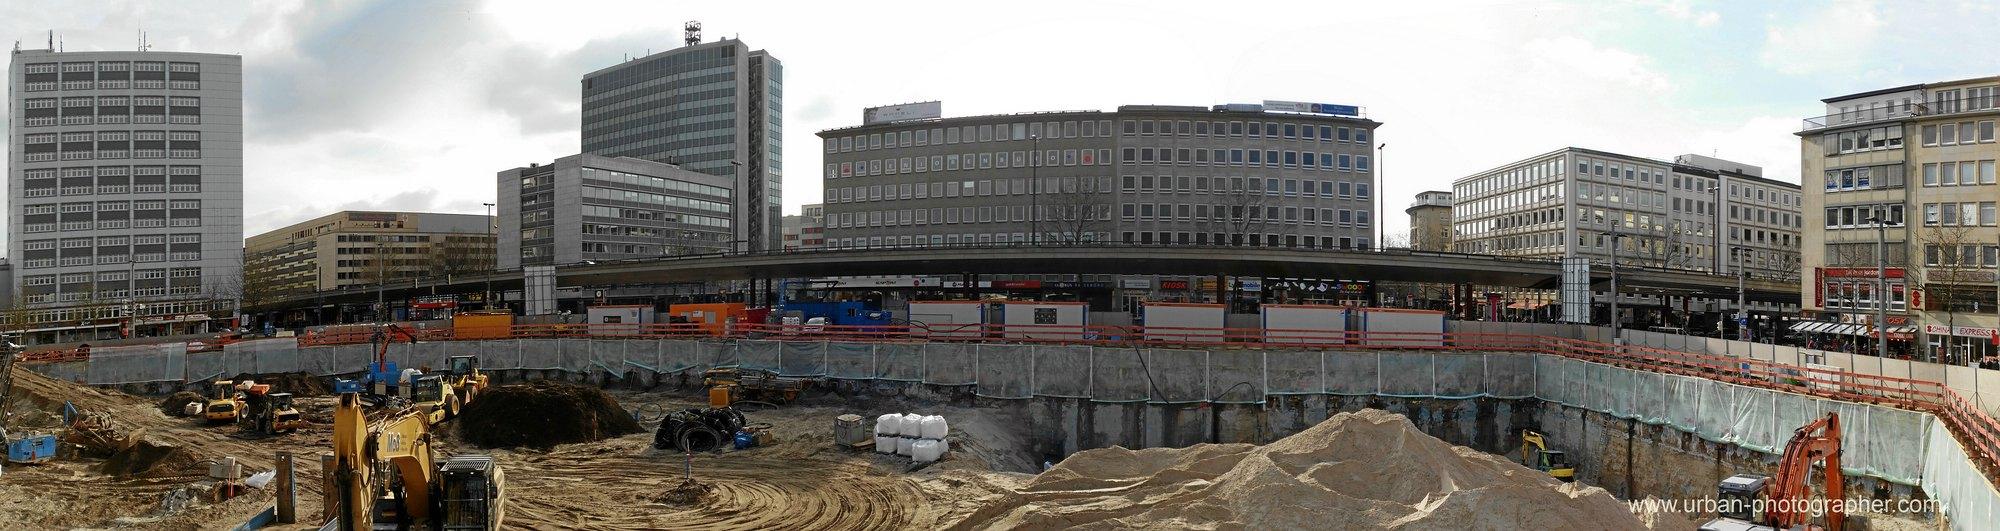 Baustelle Bahnhofsplatz 19